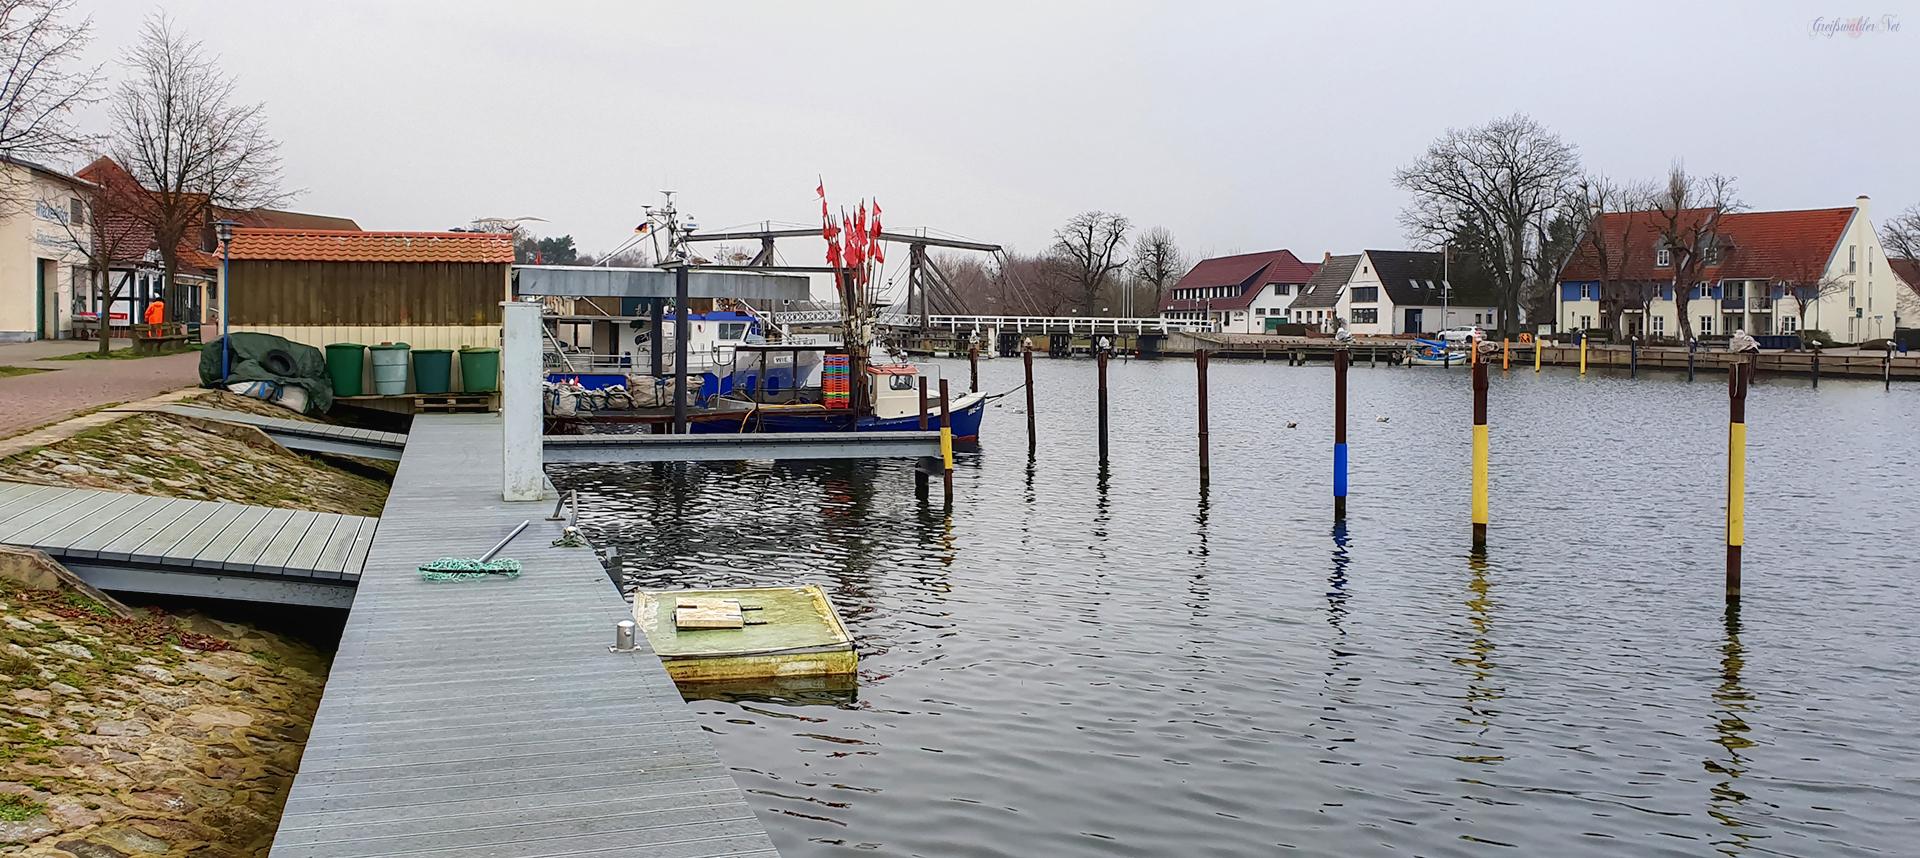 Wochenende in Greifswald-Wieck